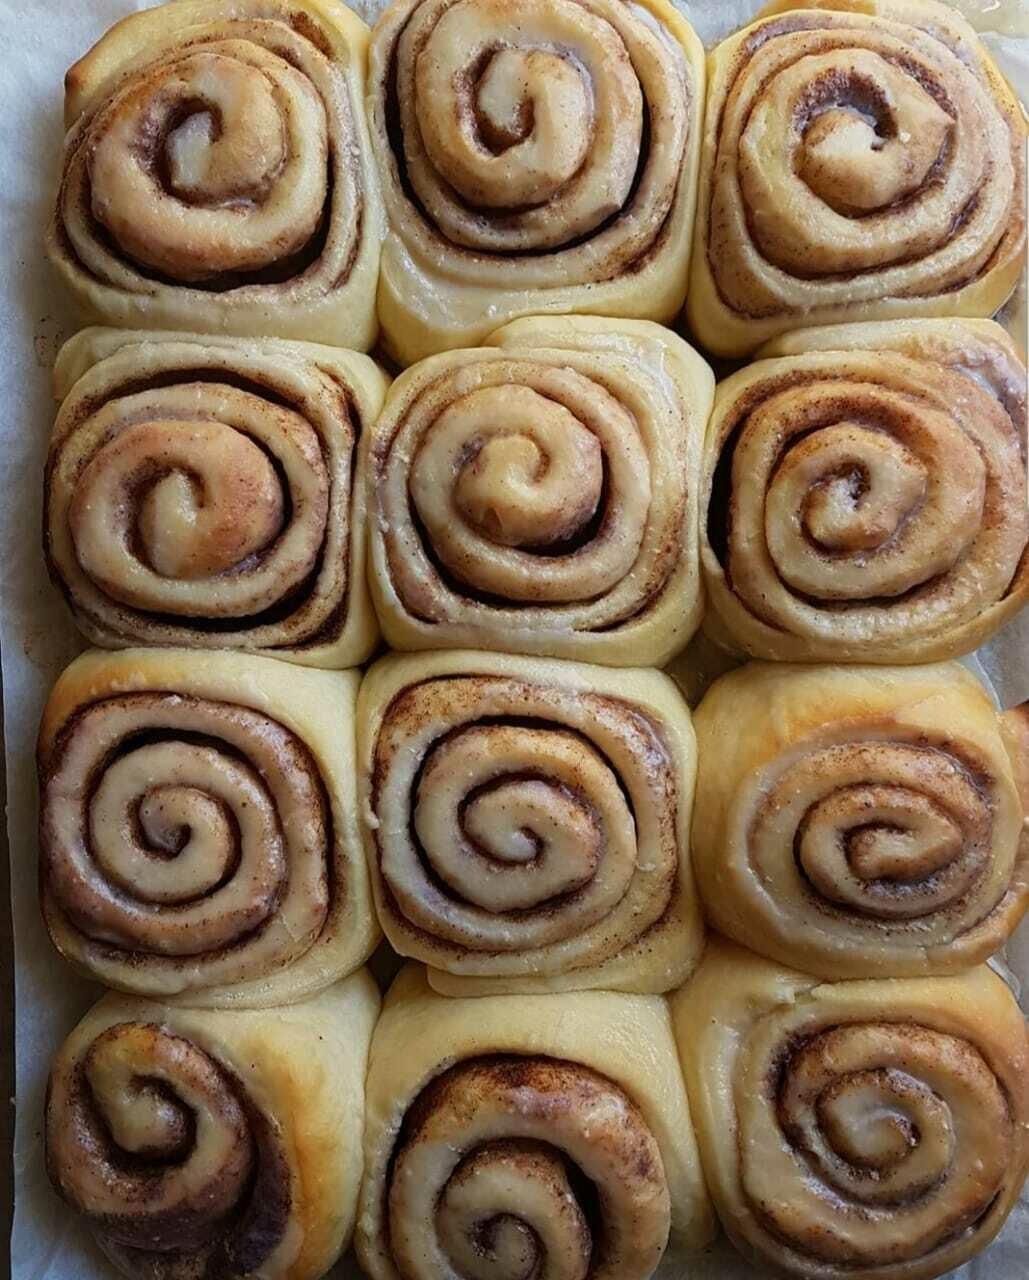 Rolls Cinnamon لفائف القرفة (Pack of 6) - Crafting Delices